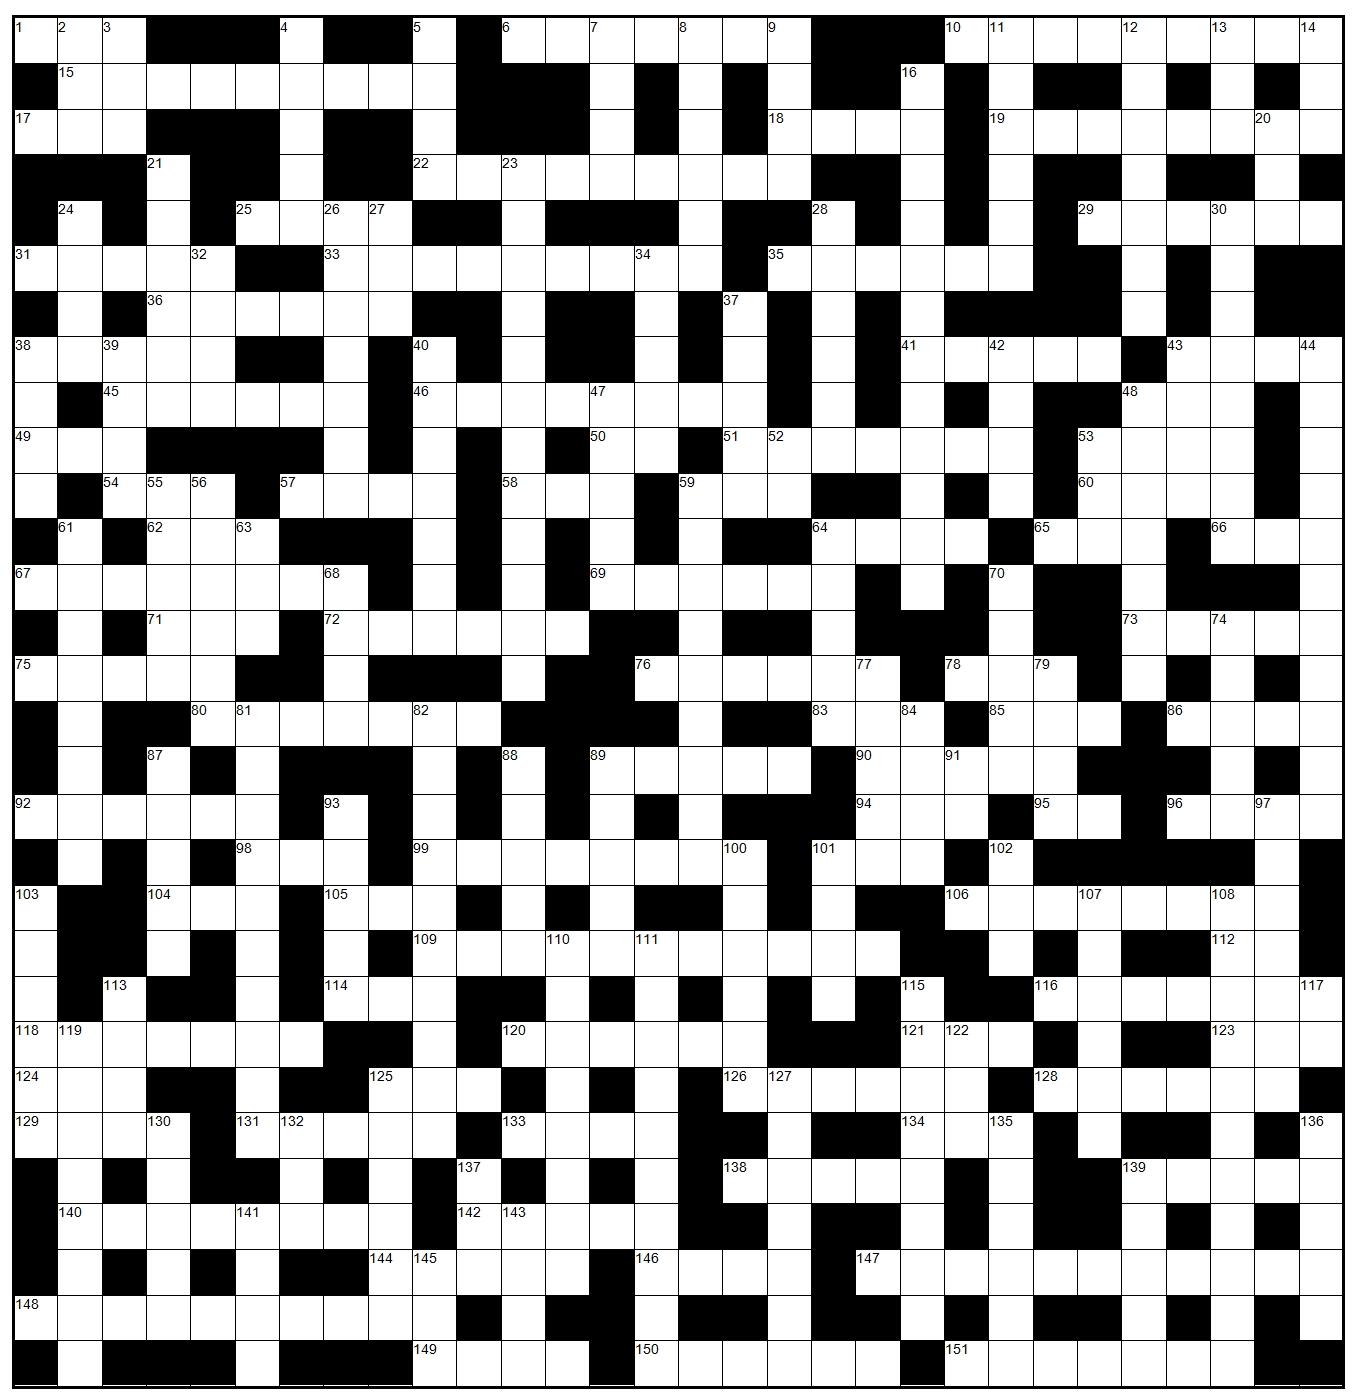 Cheat Swindle Crossword Clue